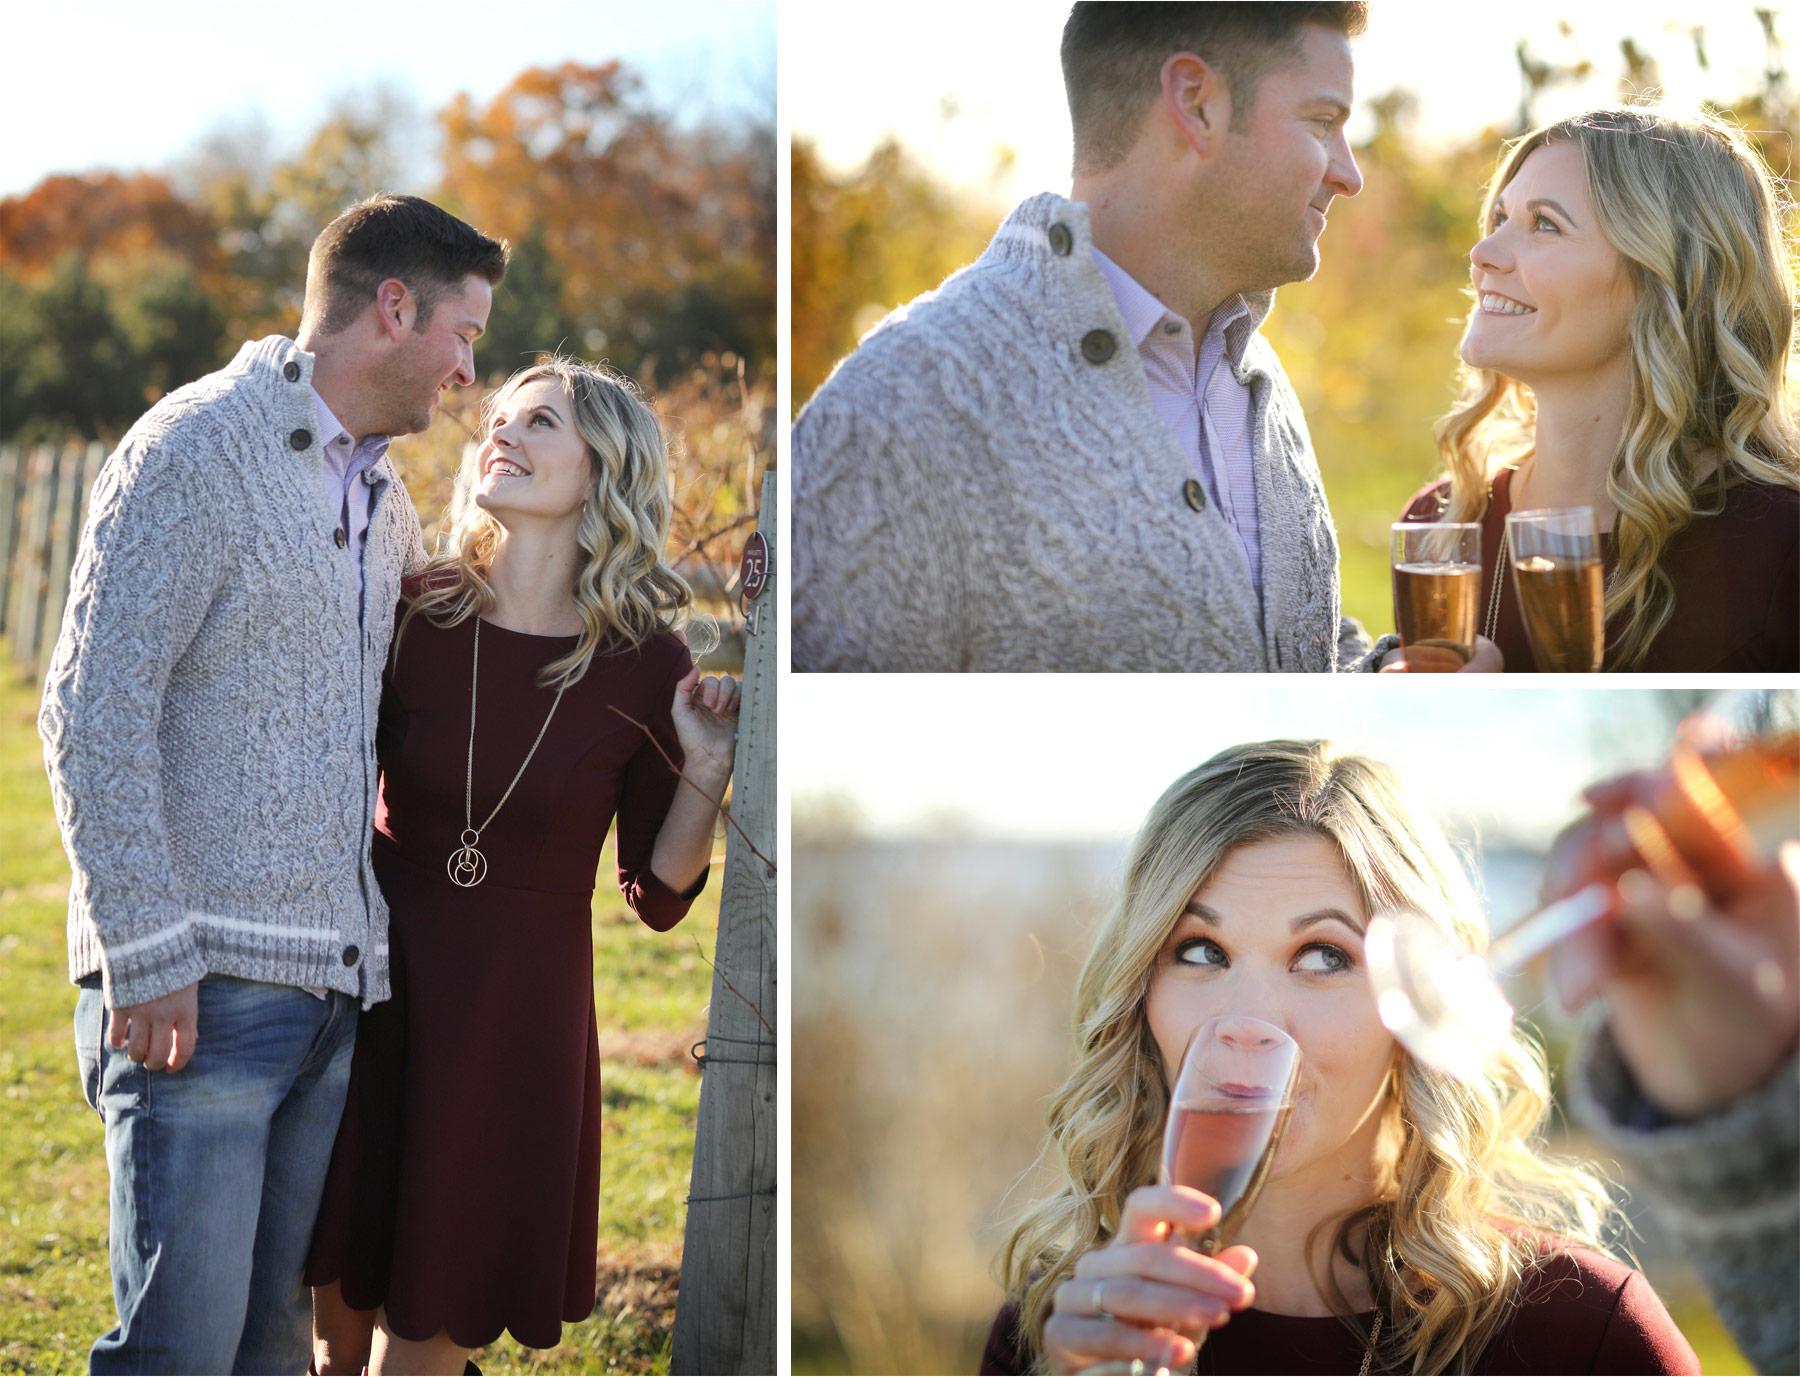 05-Vick-Photography-Destination-Engagement-Session-Wine-Vineyard-Katie-and-Bob.jpg